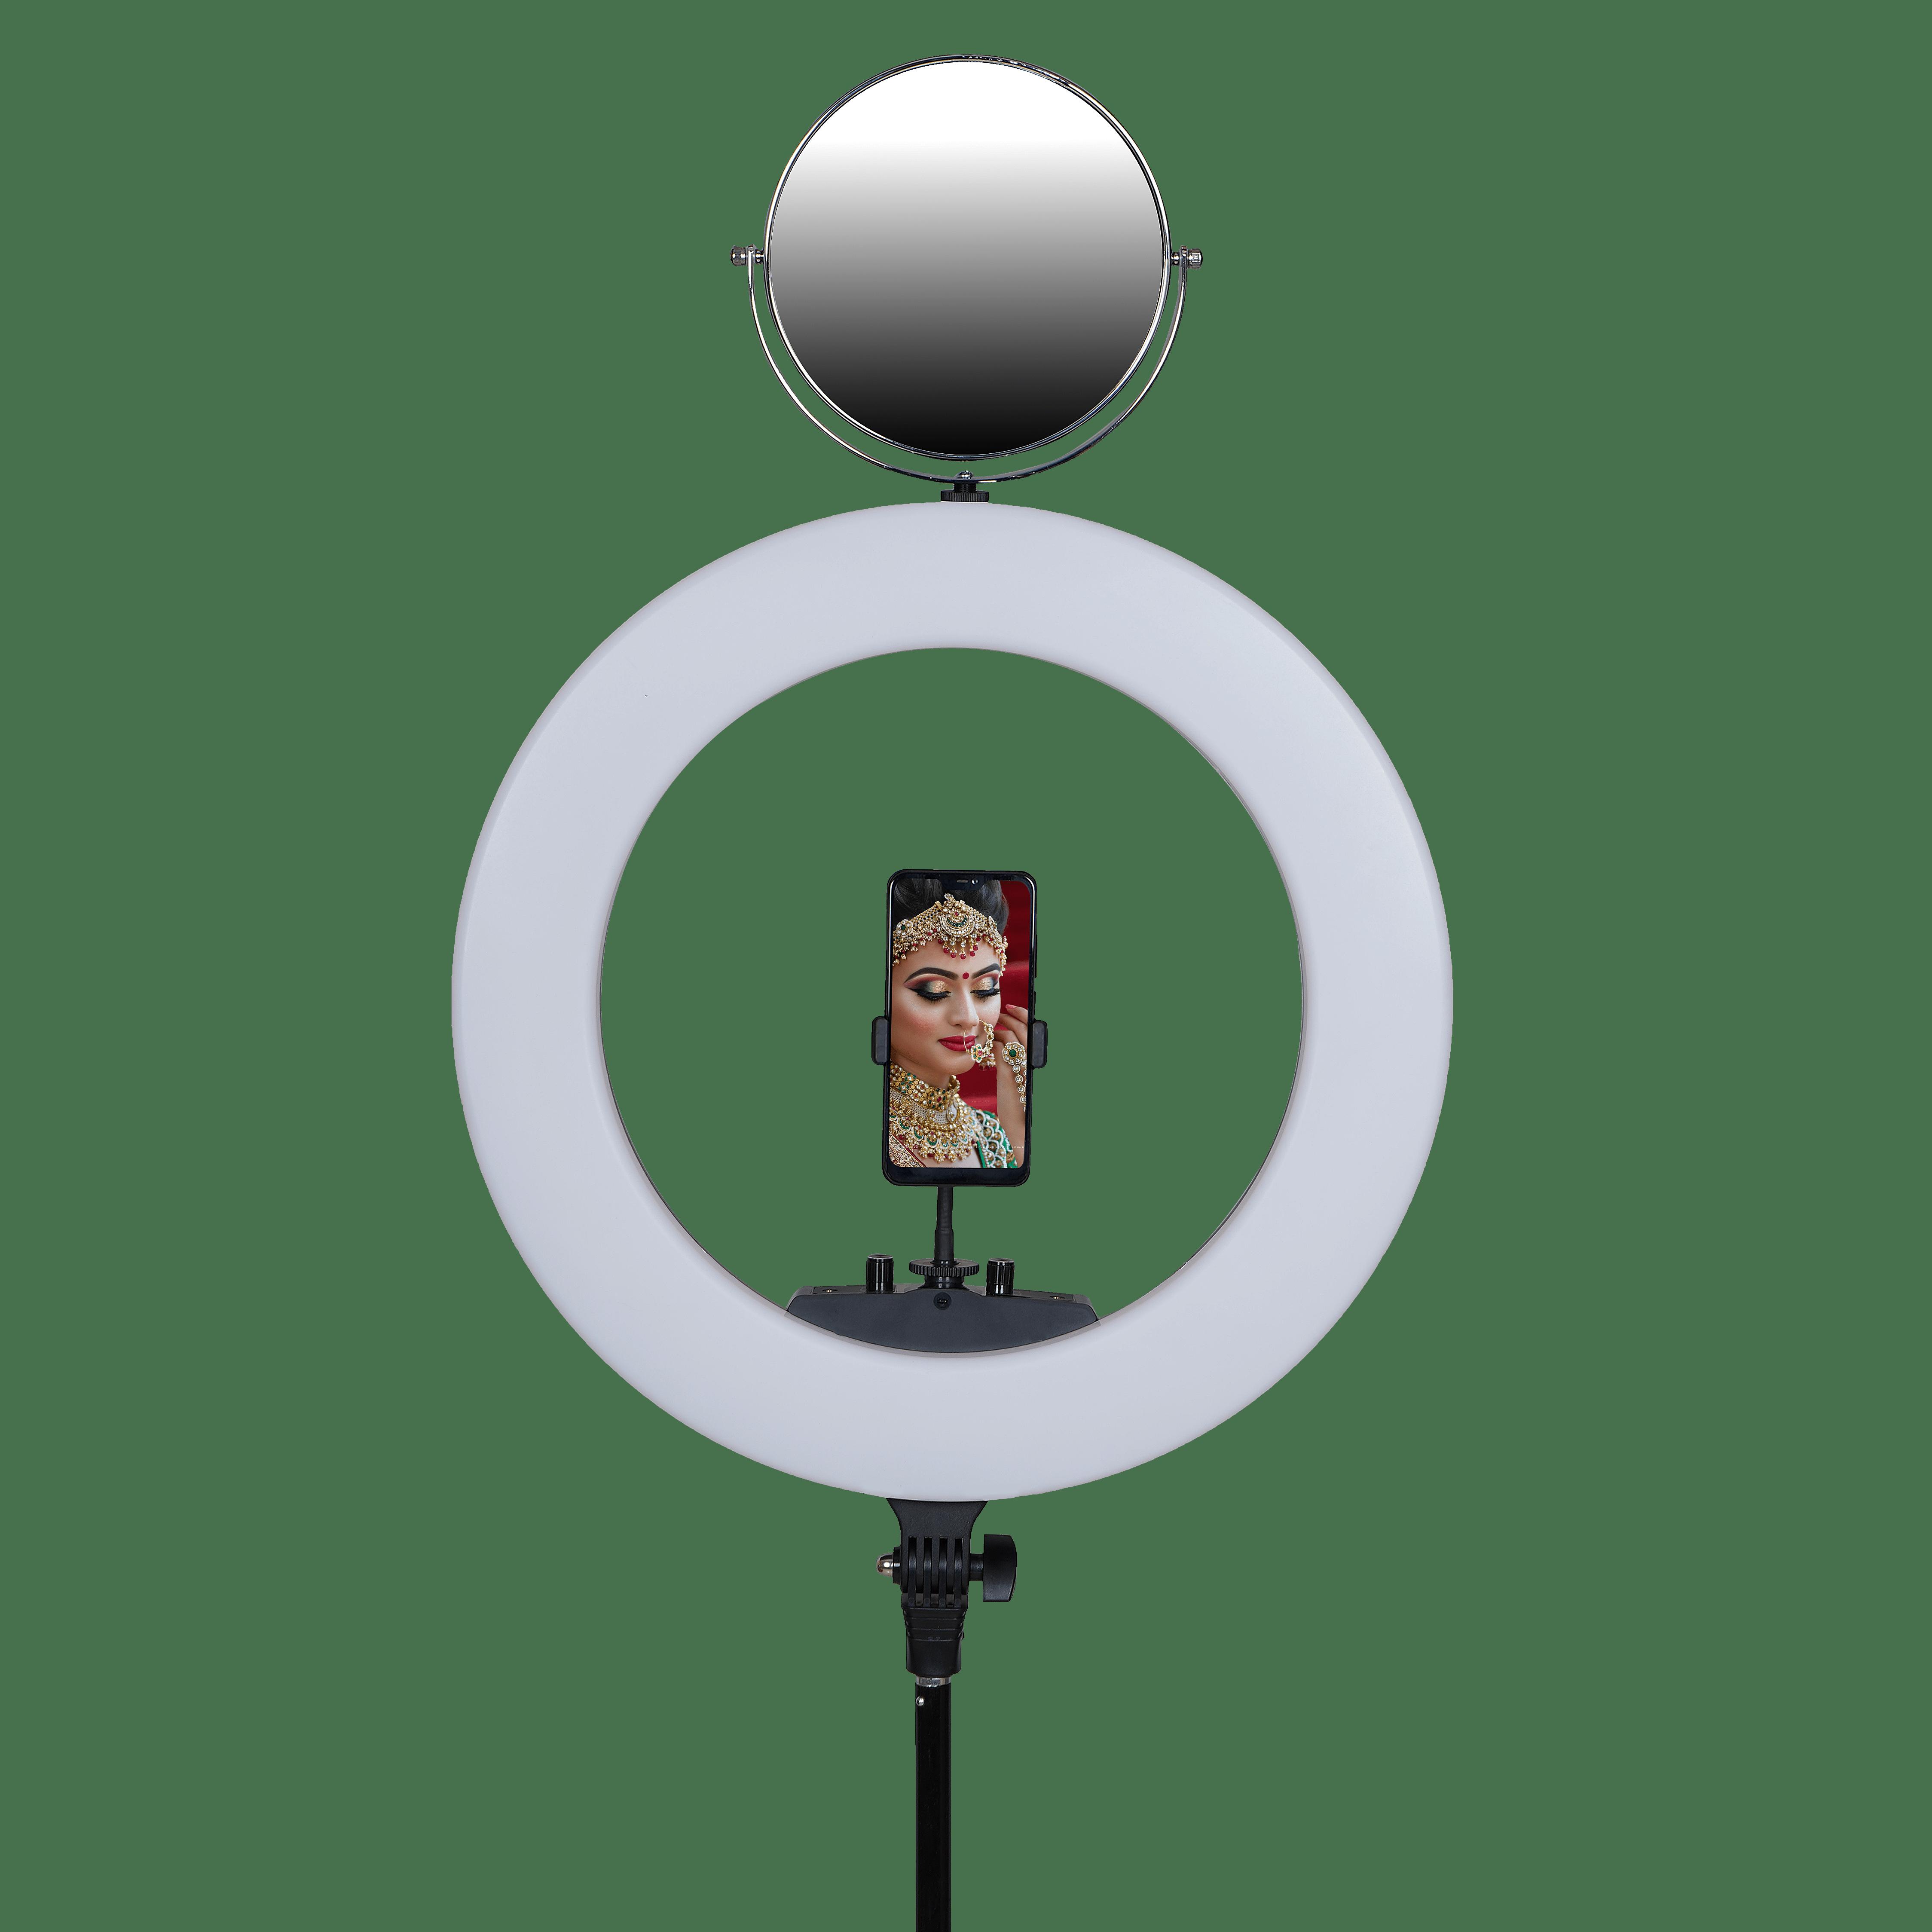 Kodak R7 20″ Ring Light With Remote, Mirror & Handle